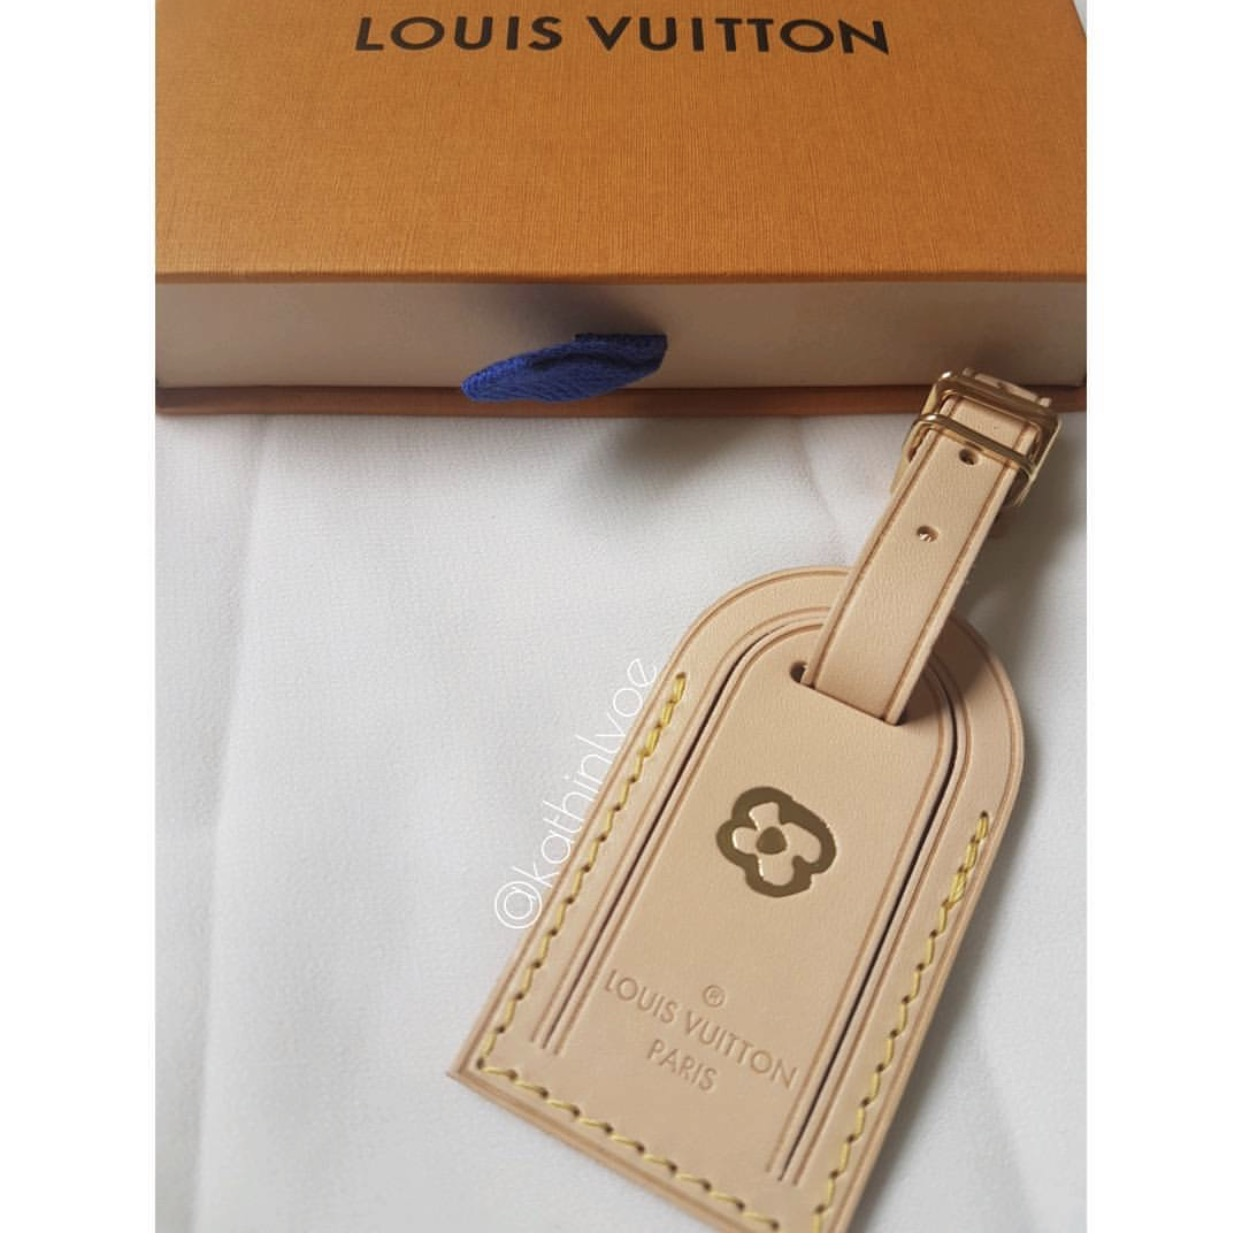 722b236bb62 ShopandBox - Buy Louis Vuitton Vachetta Luggage Tag Large from GB